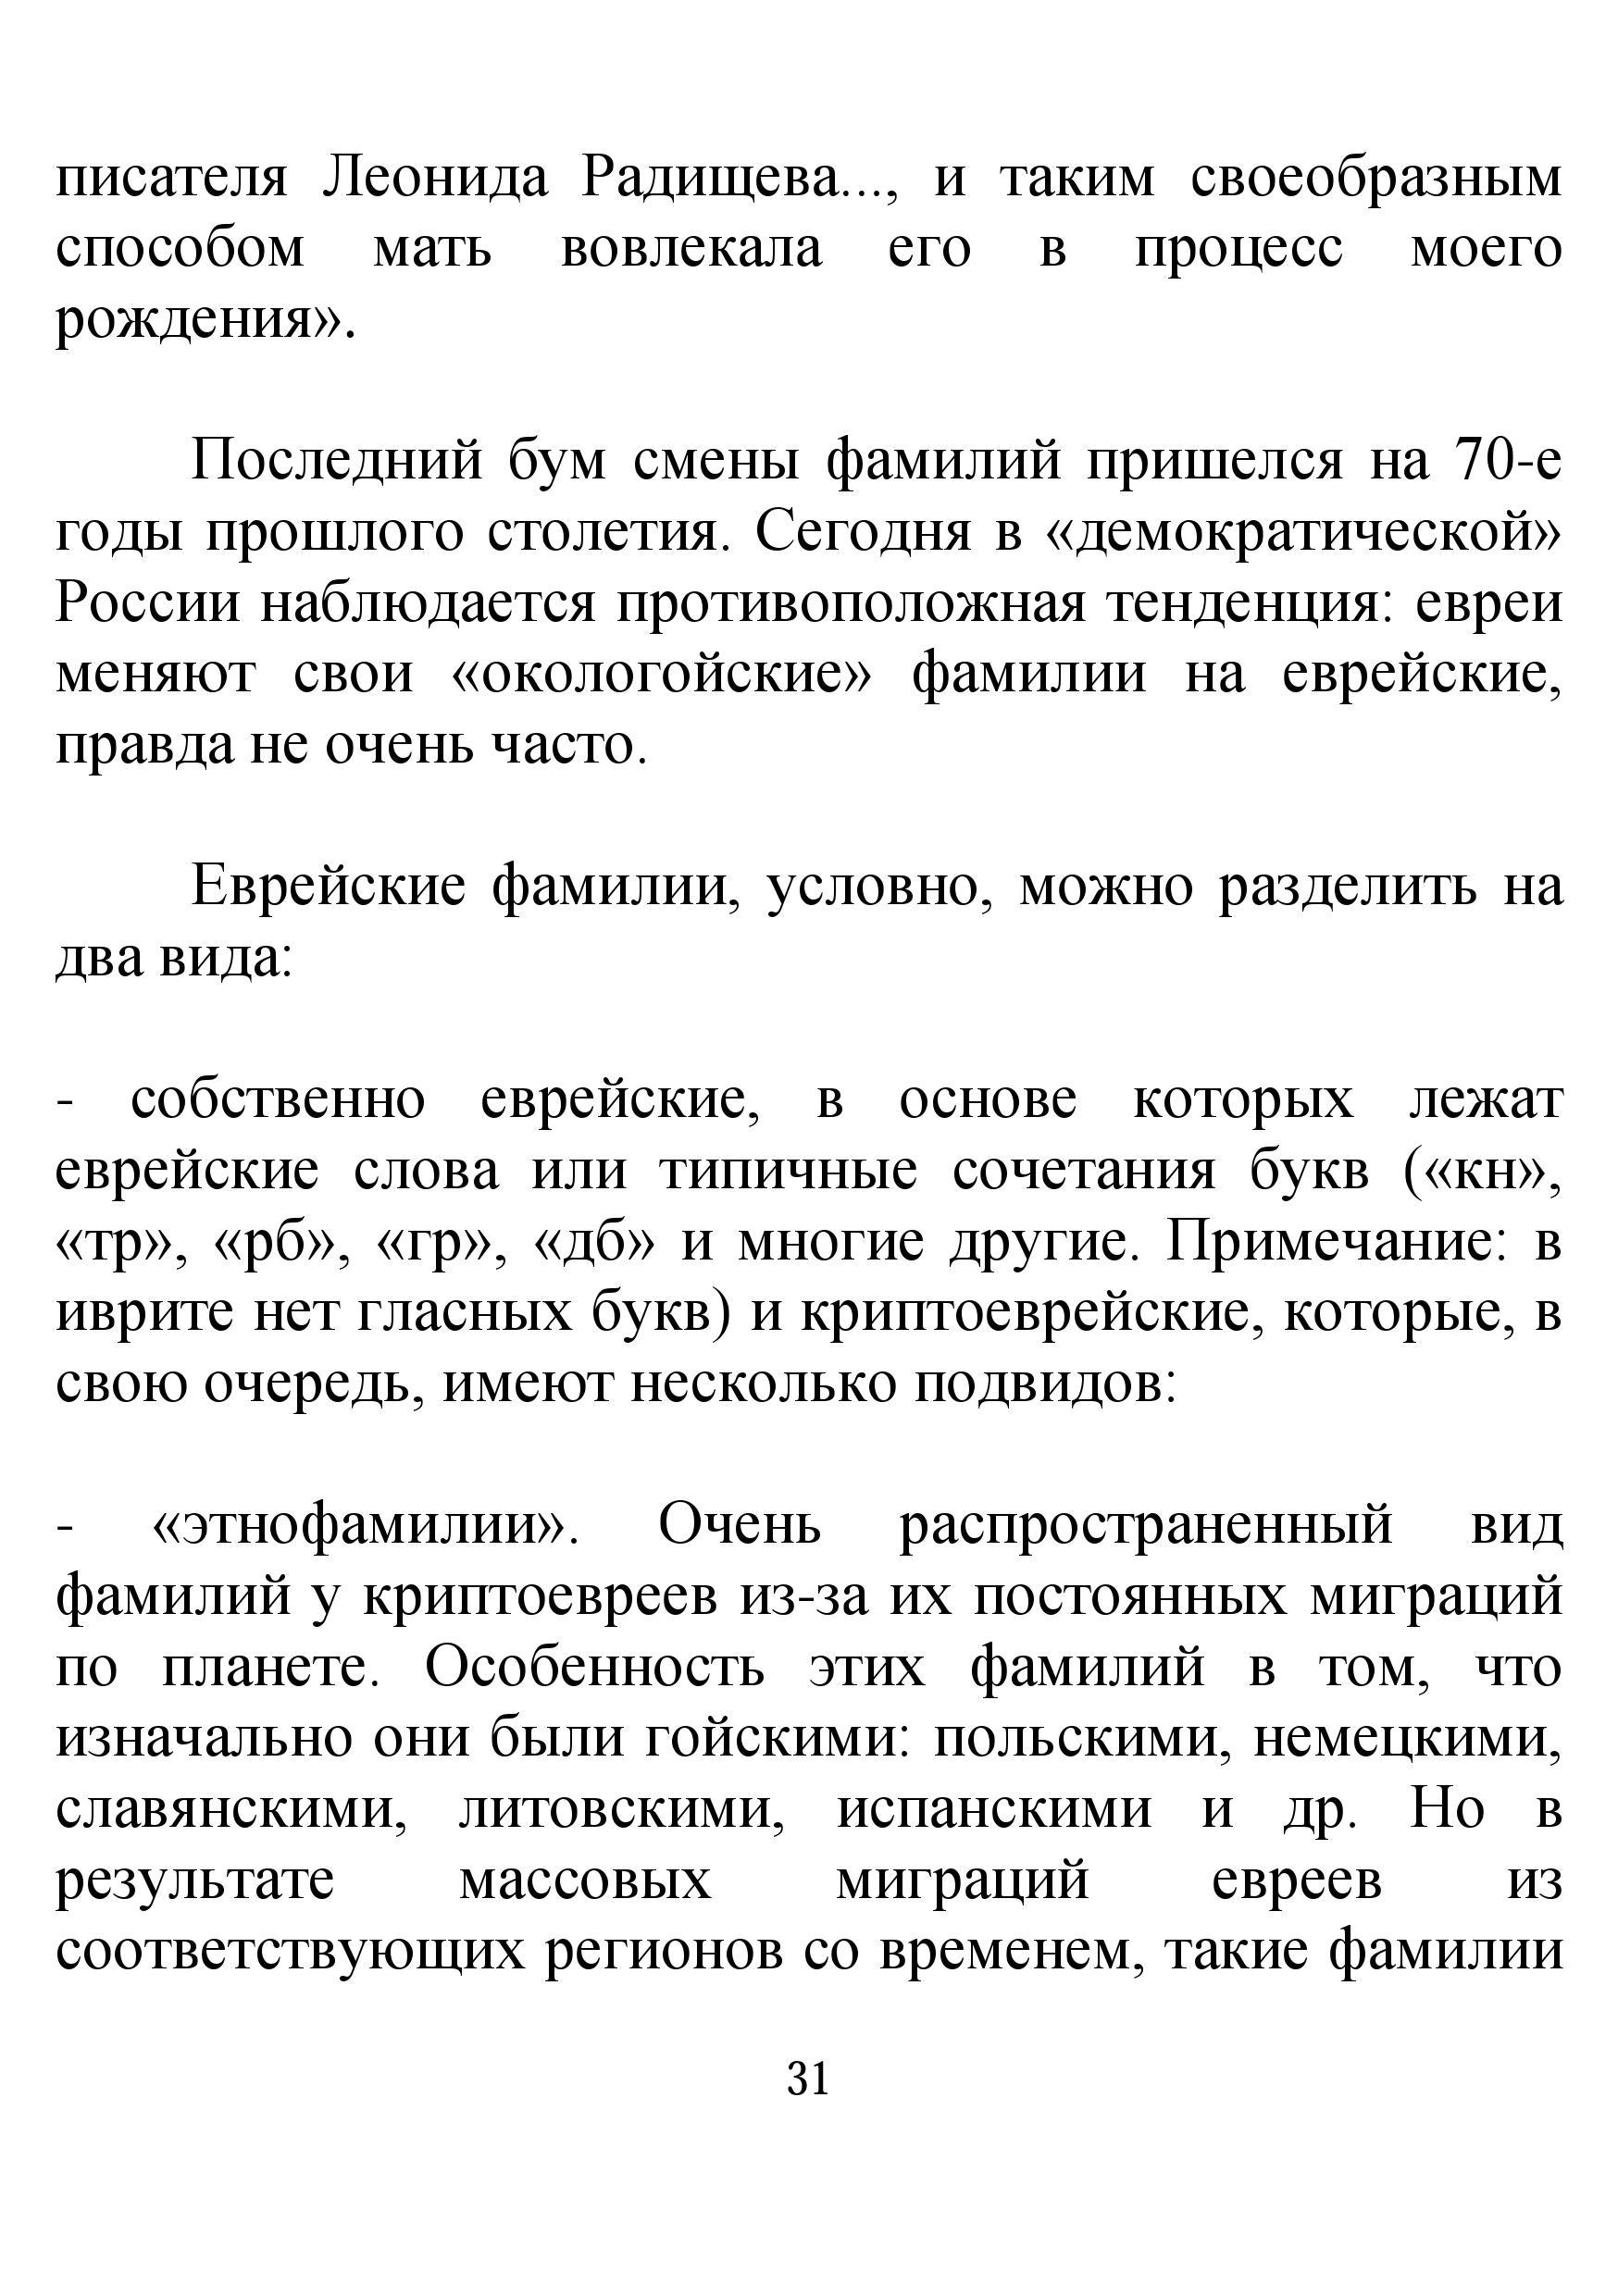 http://s4.uploads.ru/wfx97.jpg